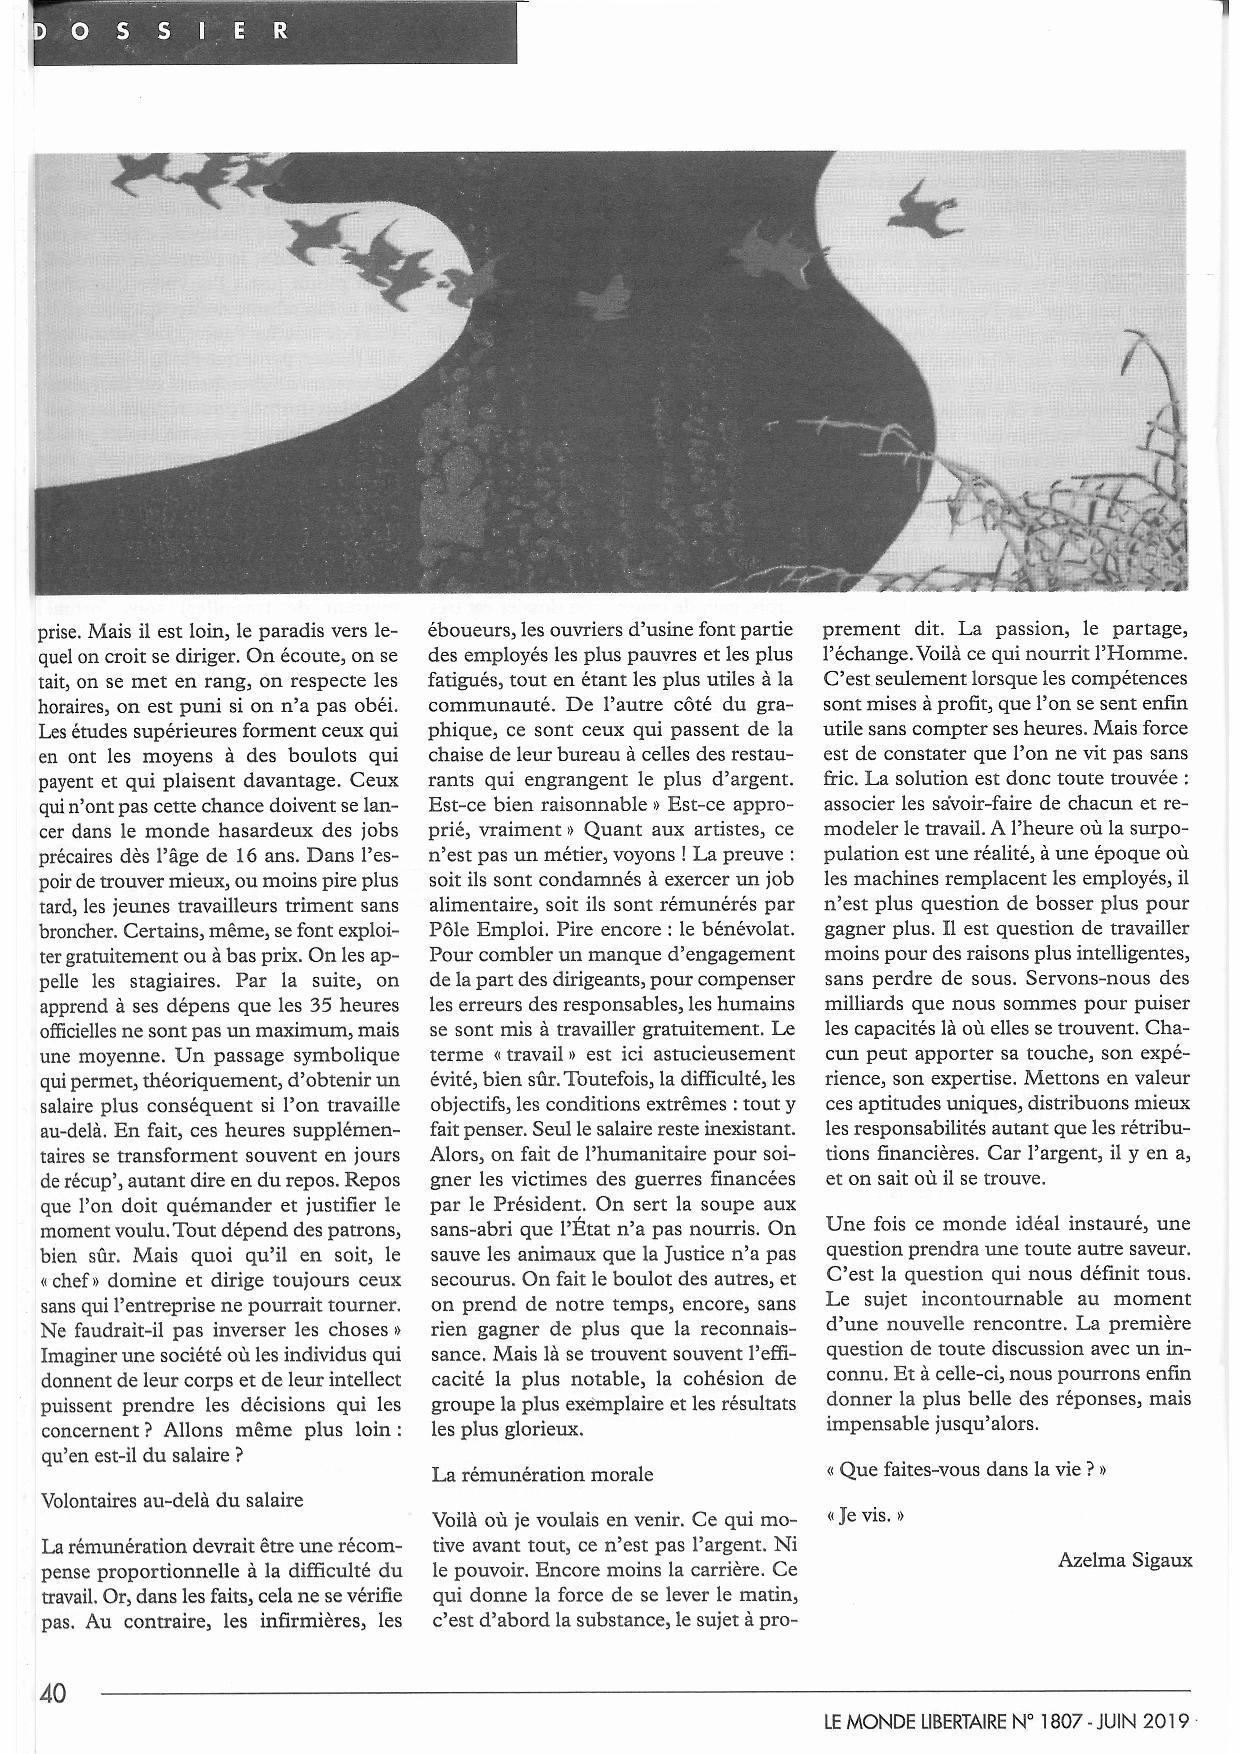 Sc mf335 1190620110300 page 001